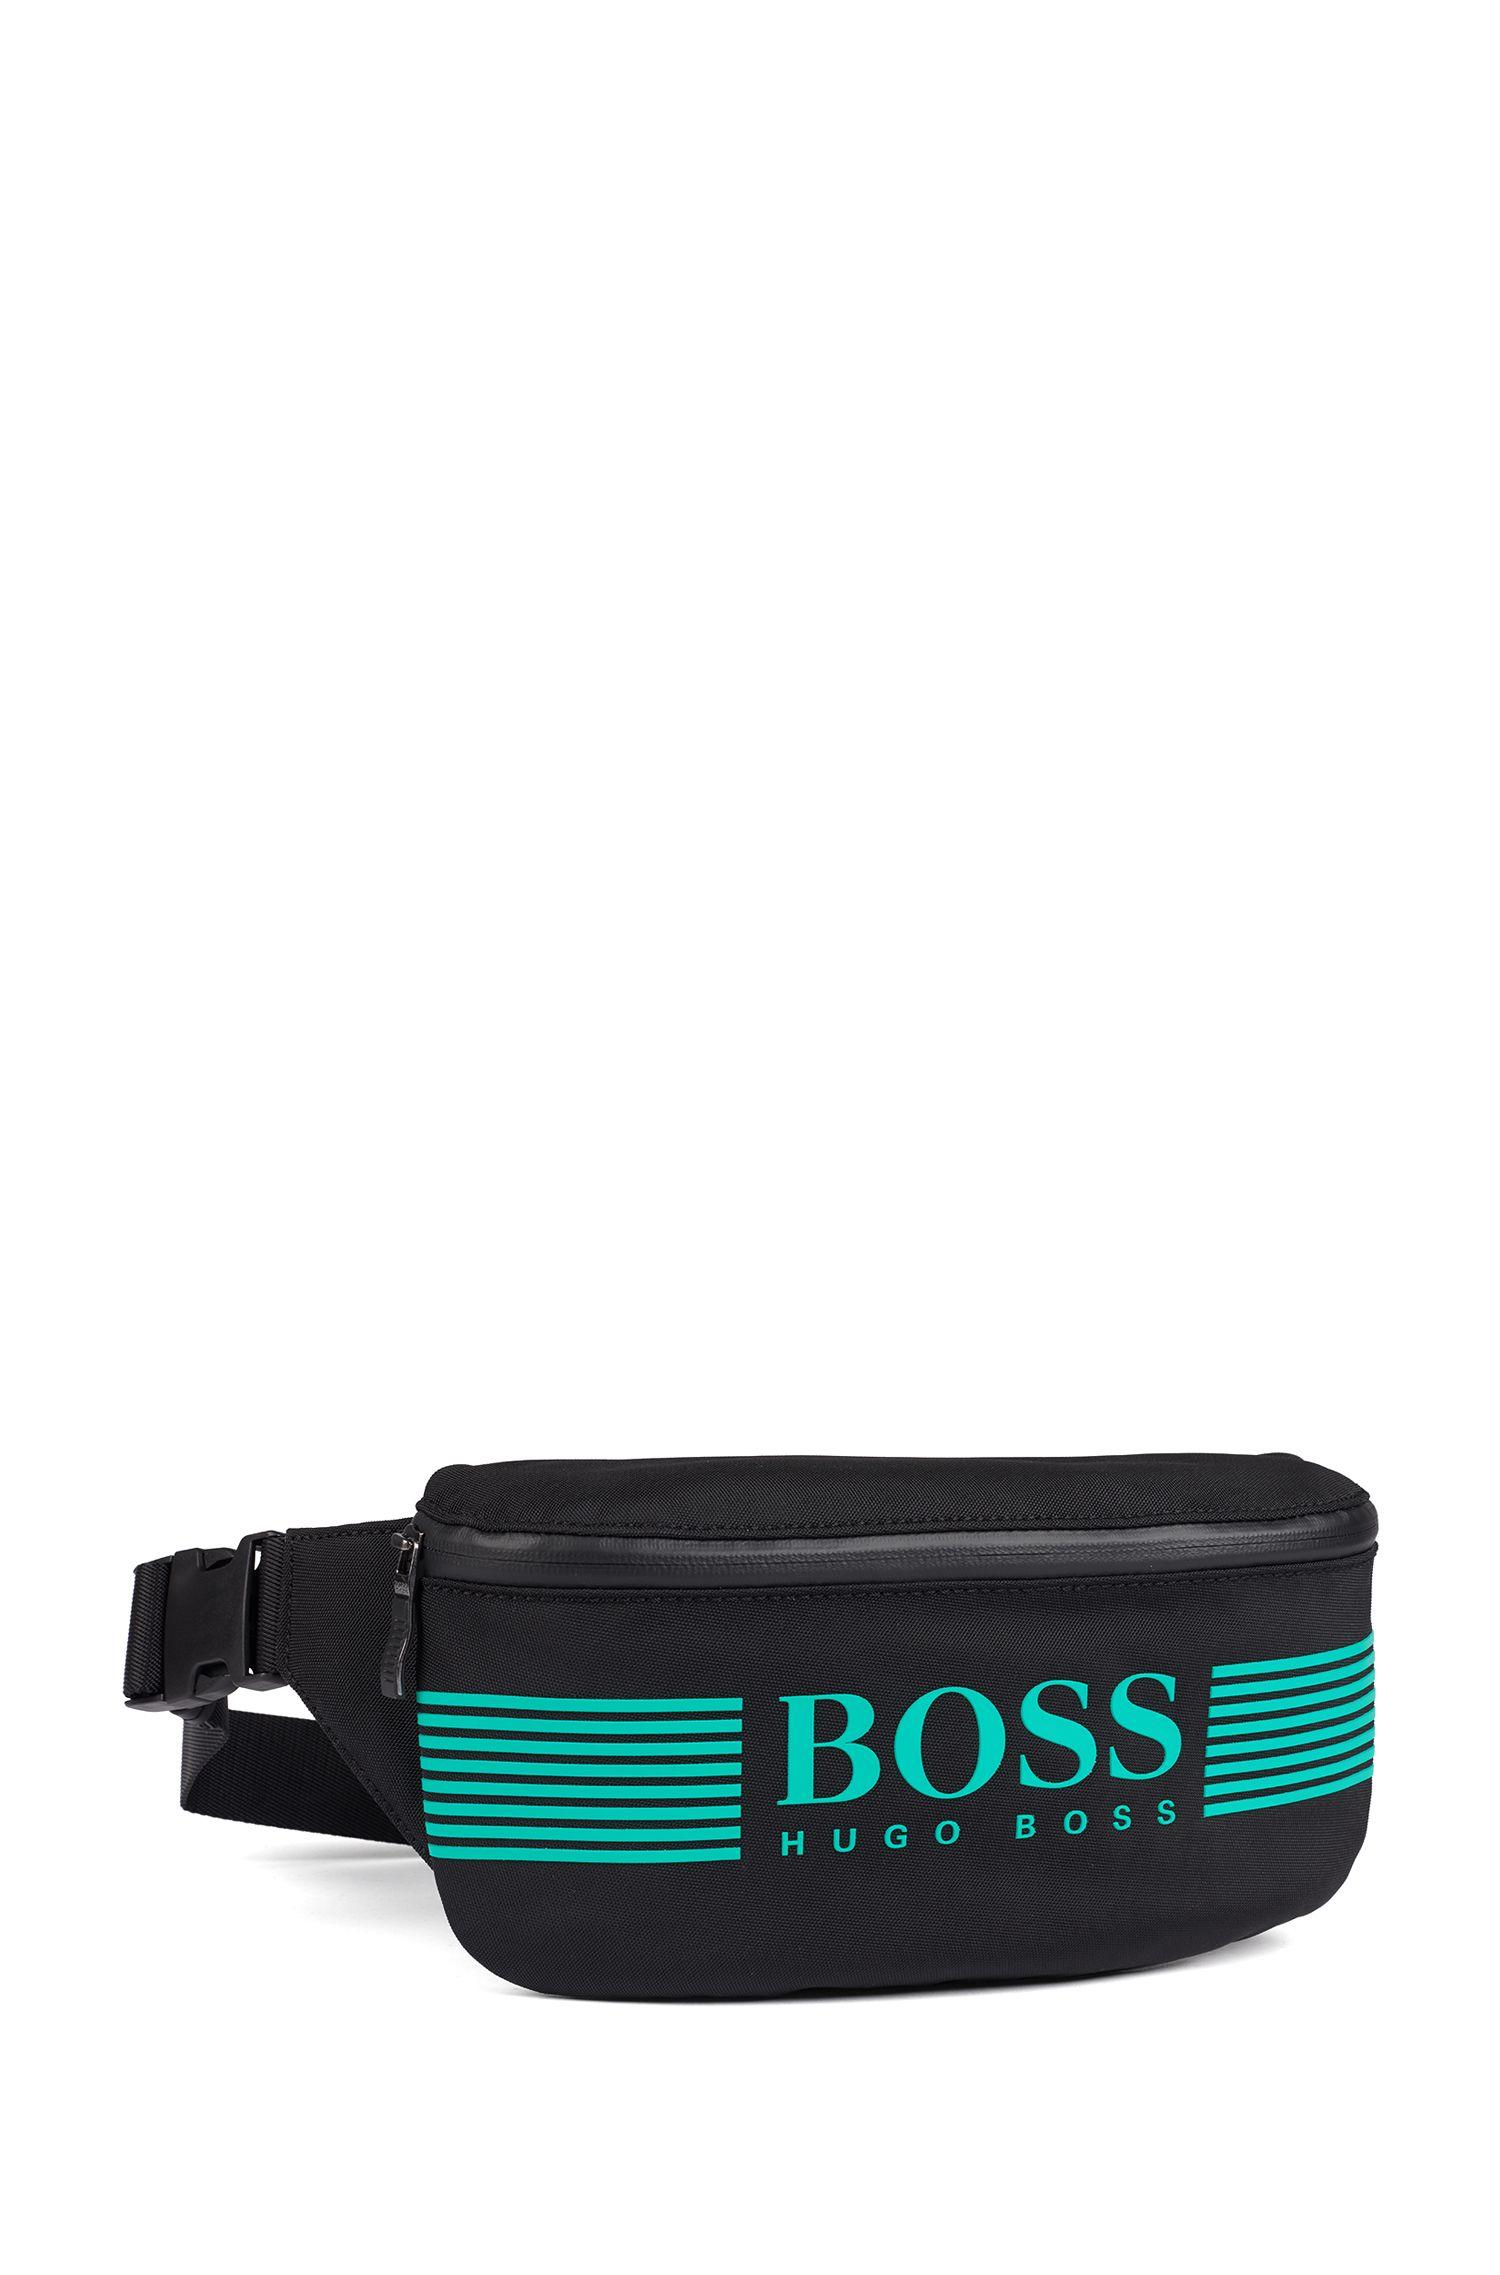 Logo belt bag in structured nylon, Black